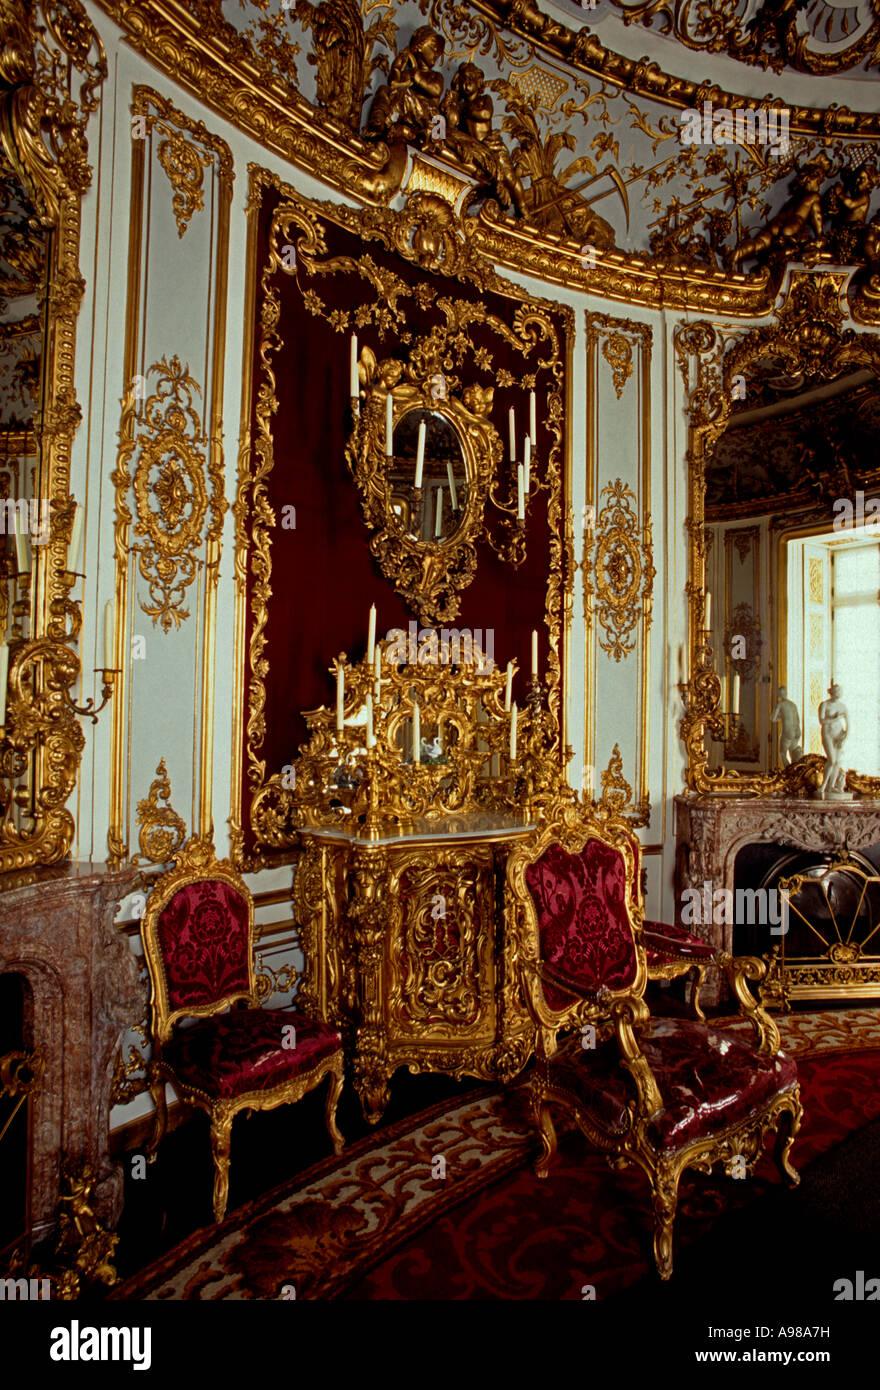 linderhof castle interior photos linderhof castle interior images alamy. Black Bedroom Furniture Sets. Home Design Ideas